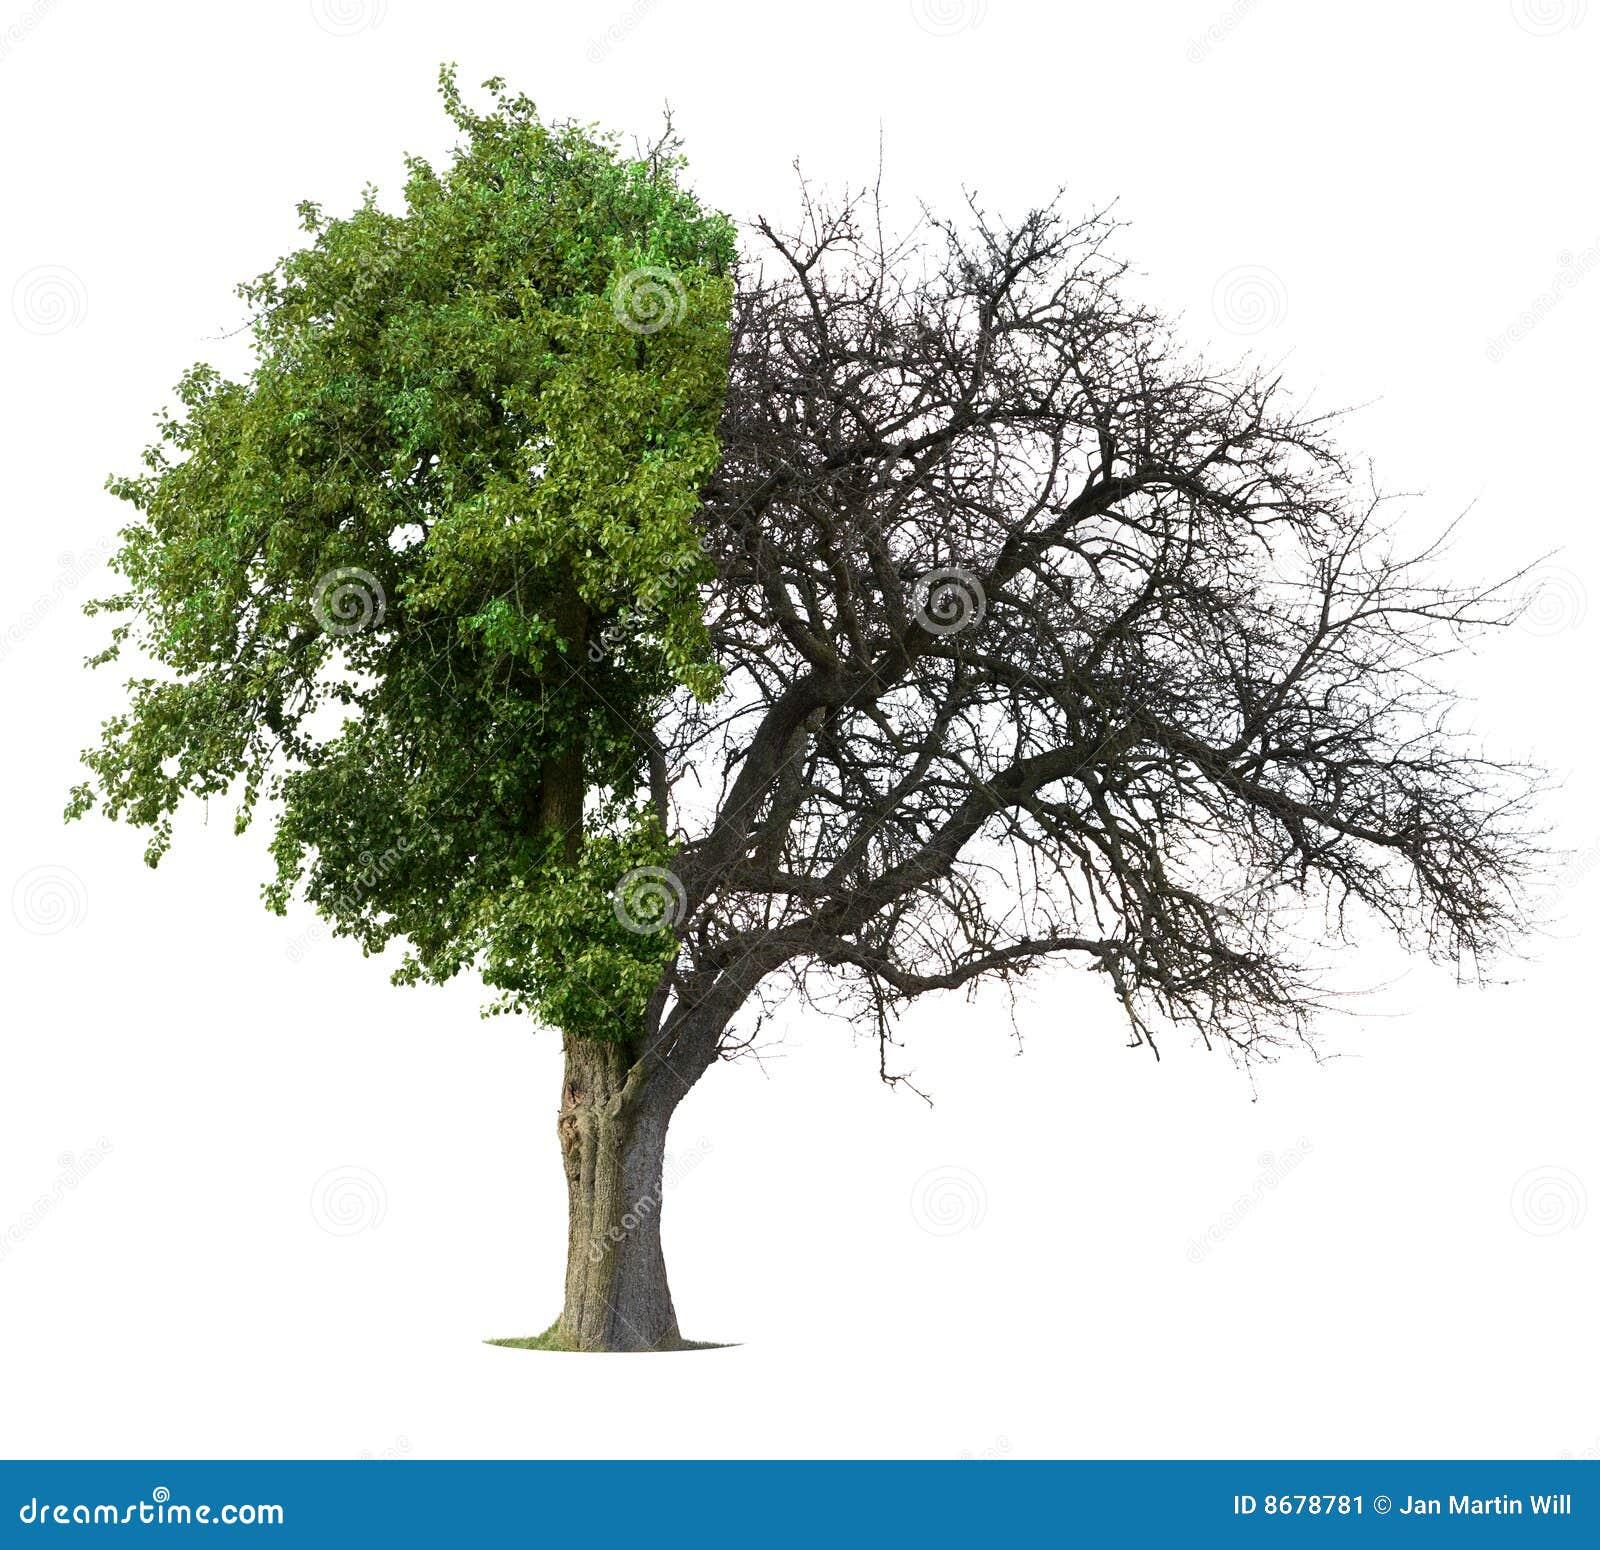 Half green half bare tree